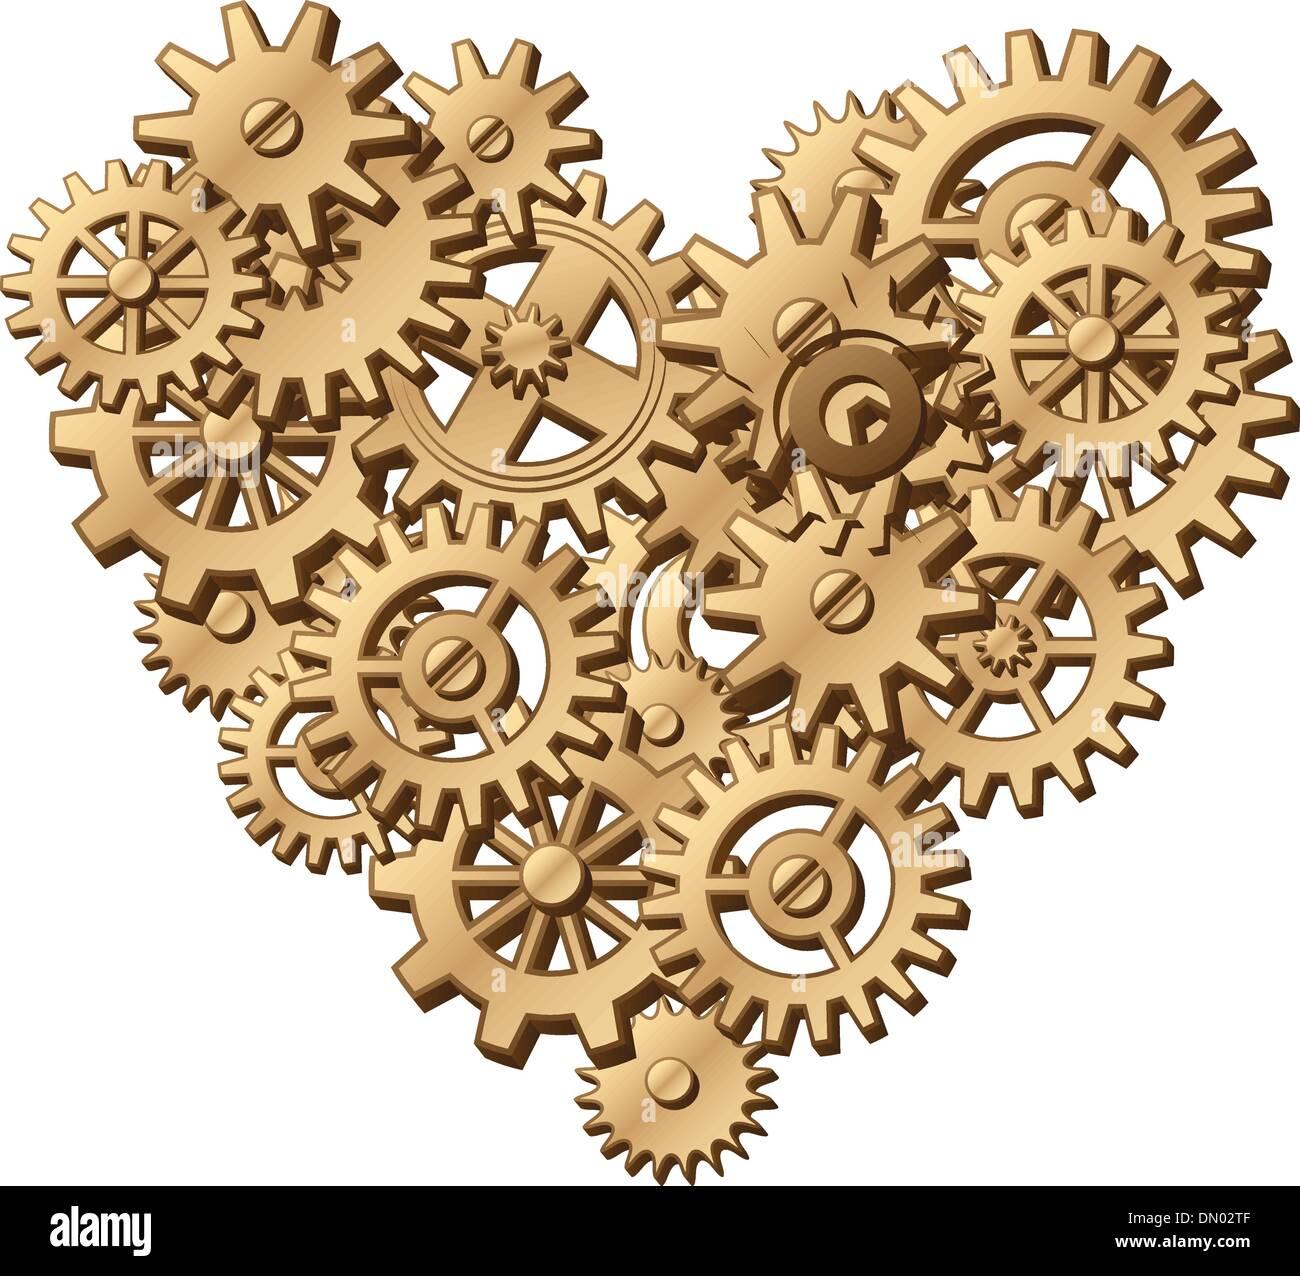 Mechanical Heart Symbol Stock Vector Art Illustration Vector